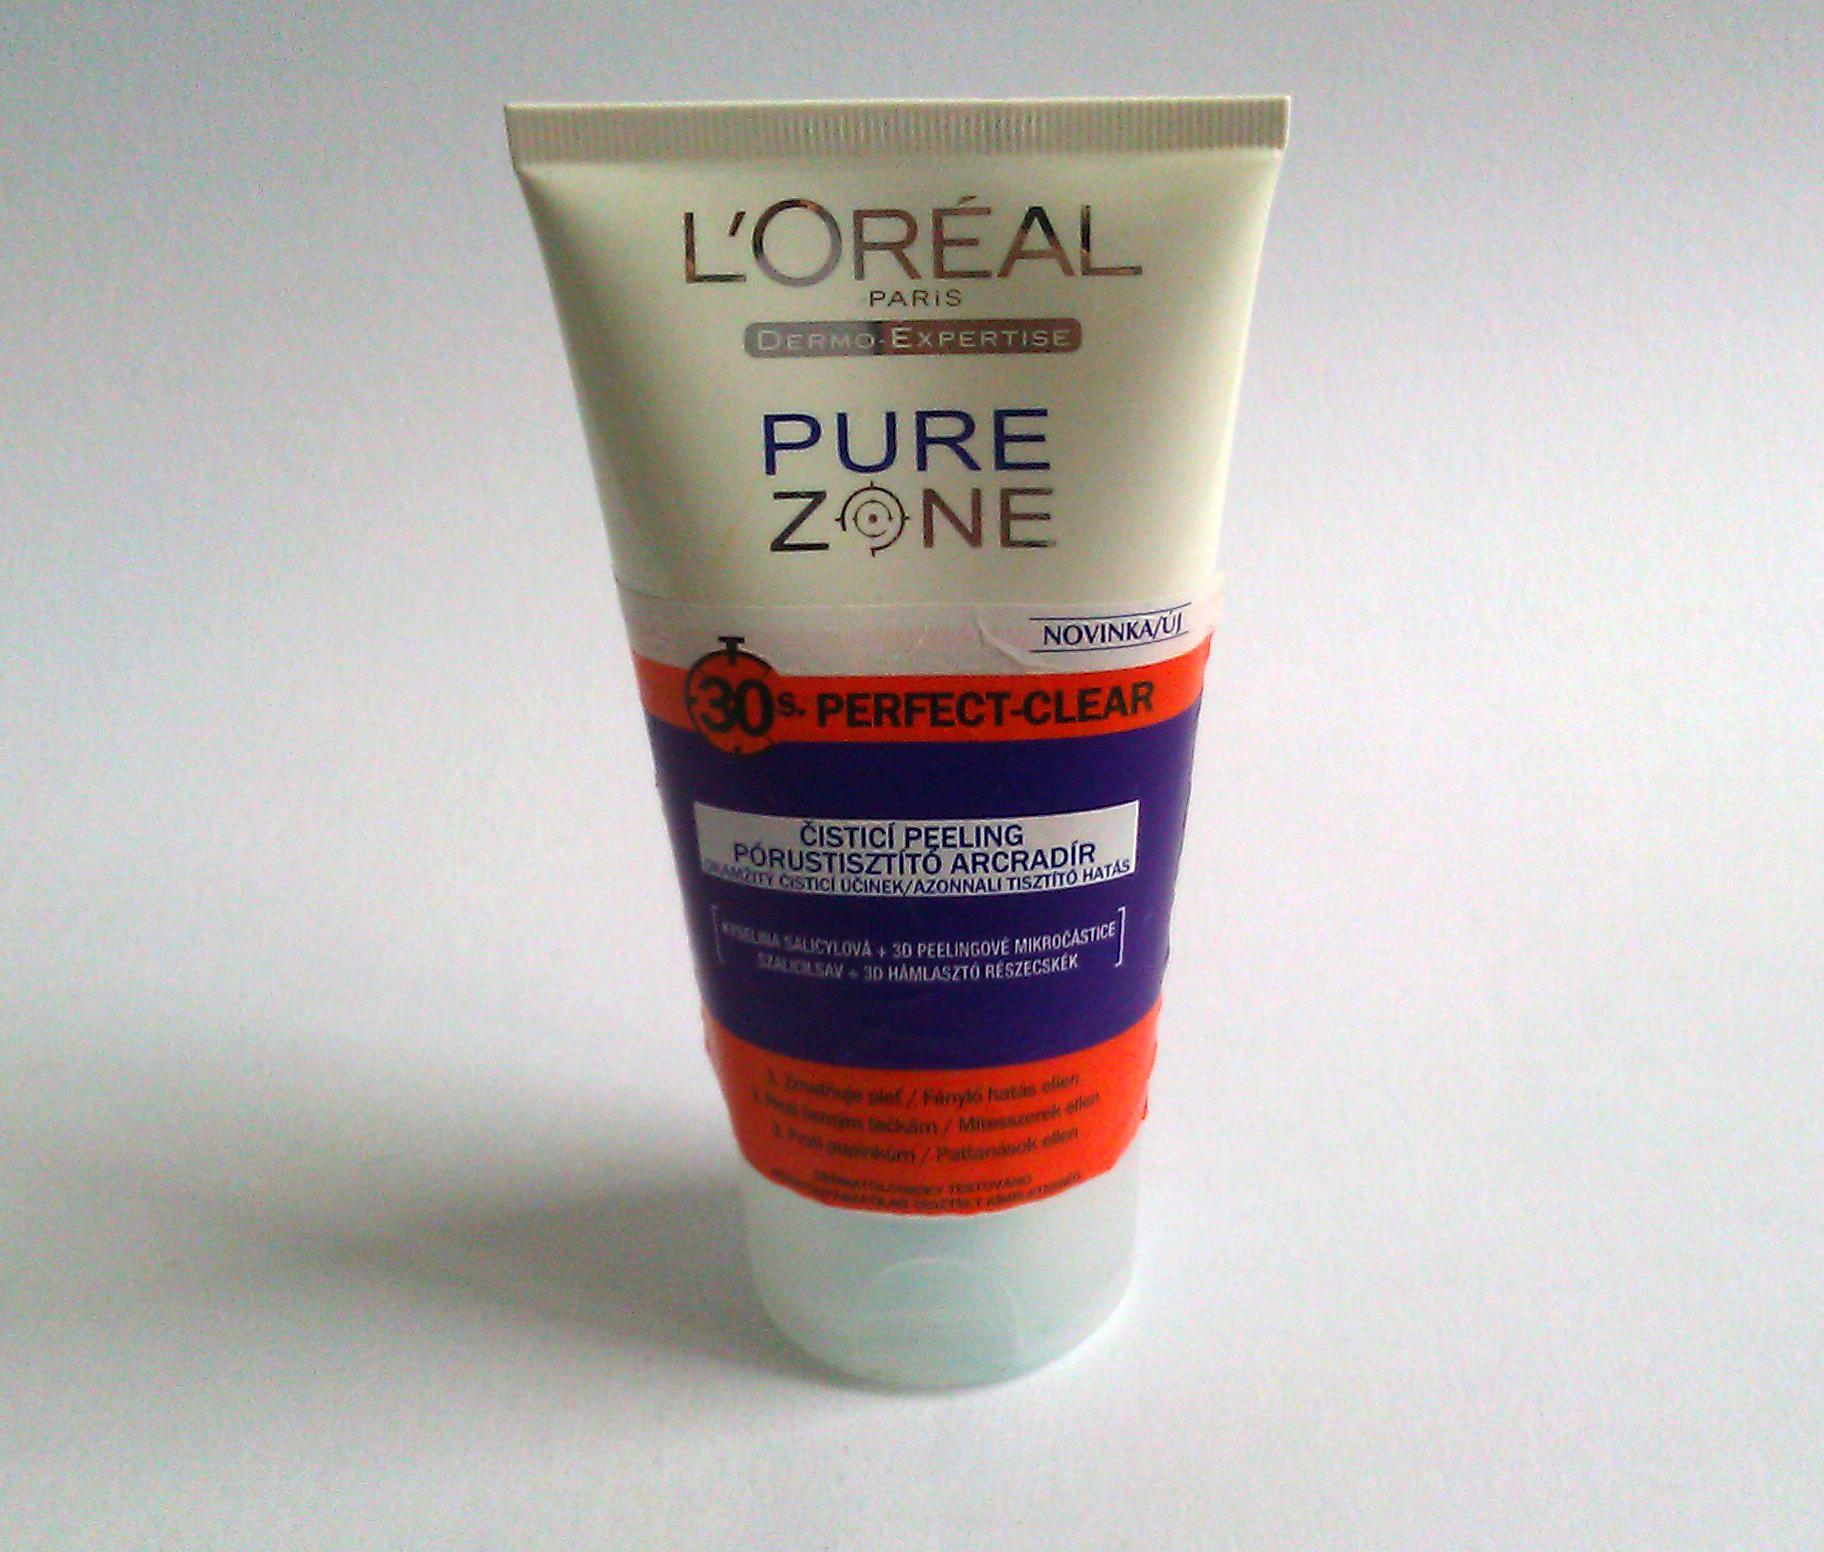 Čisticí peeling Loreal Paris Perfect-Clear Pure Zone – recenze